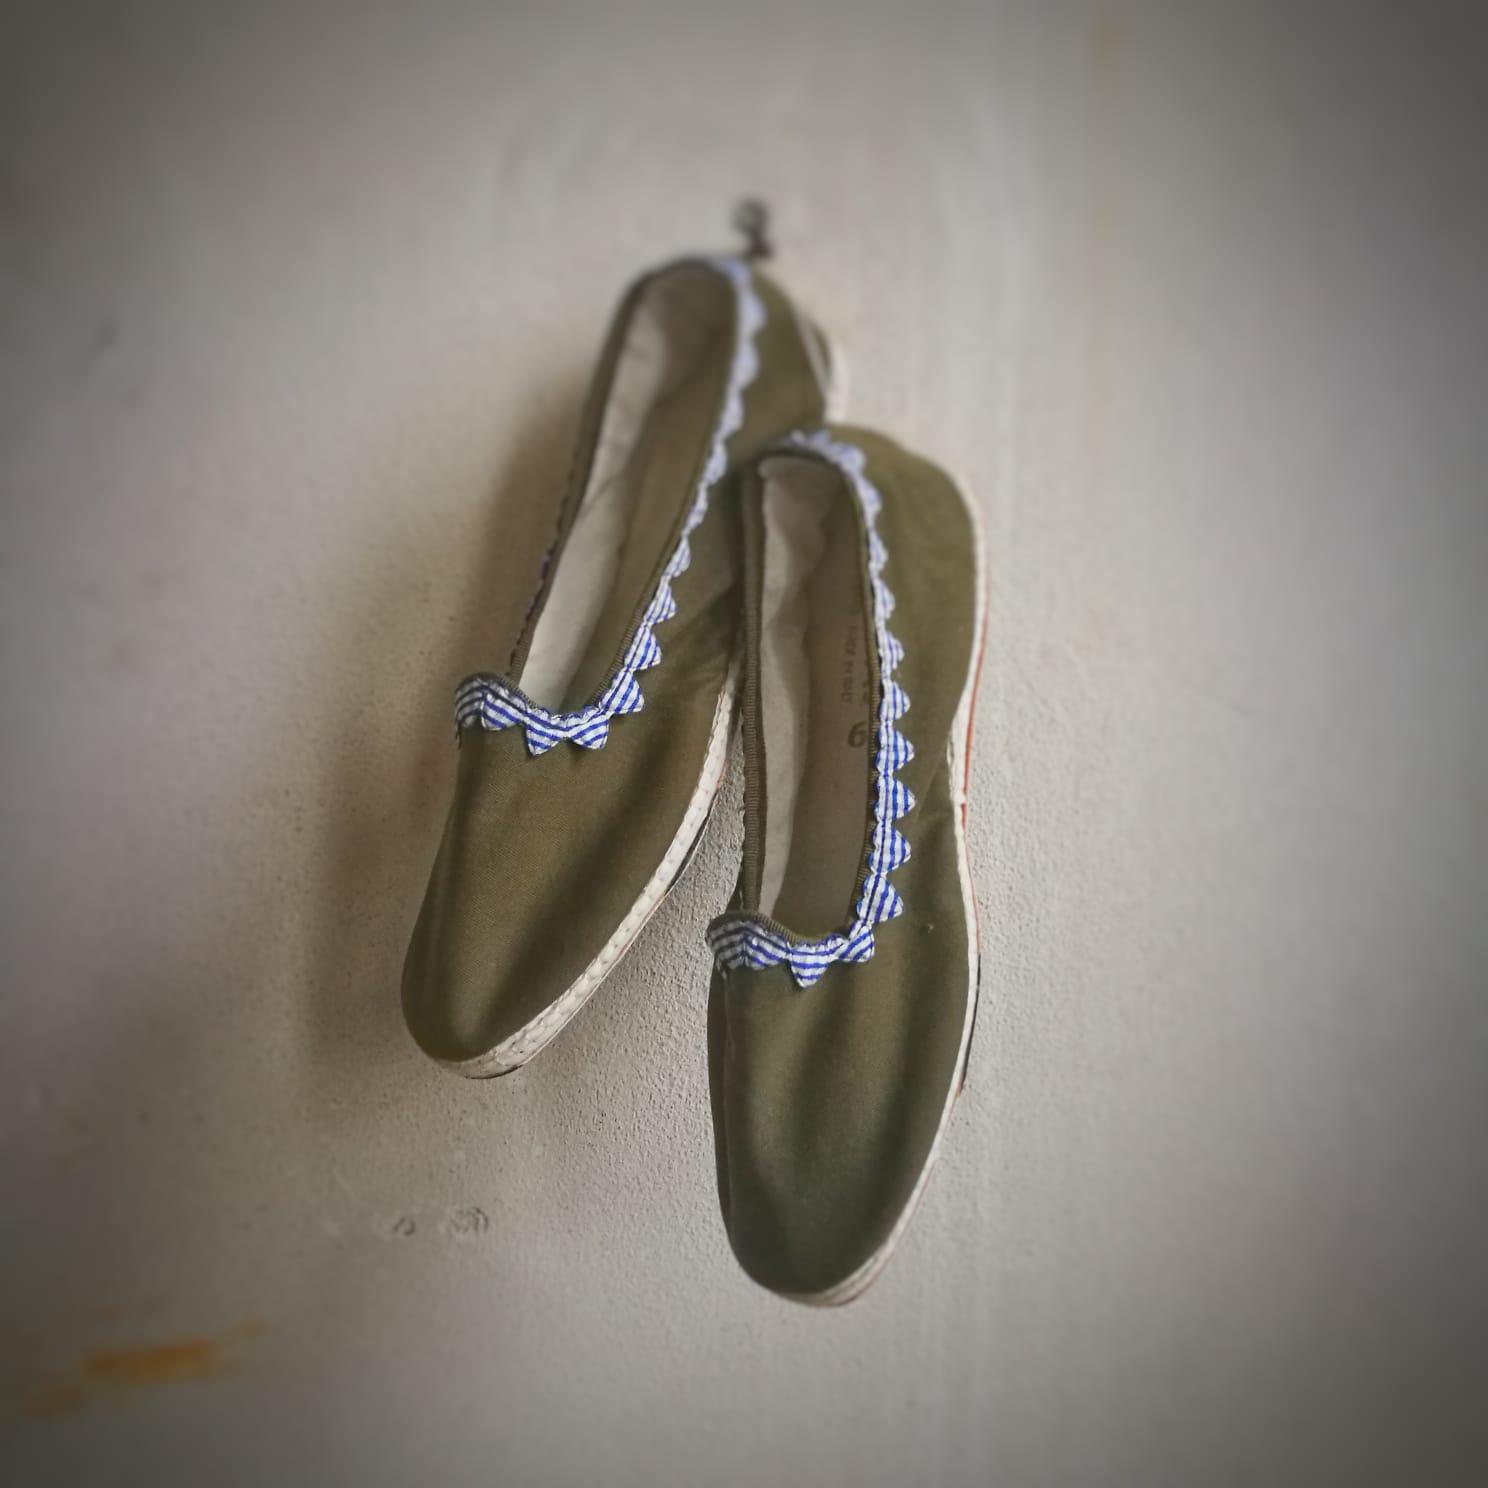 scarpes friulane con cuori artigianato lis furlanis